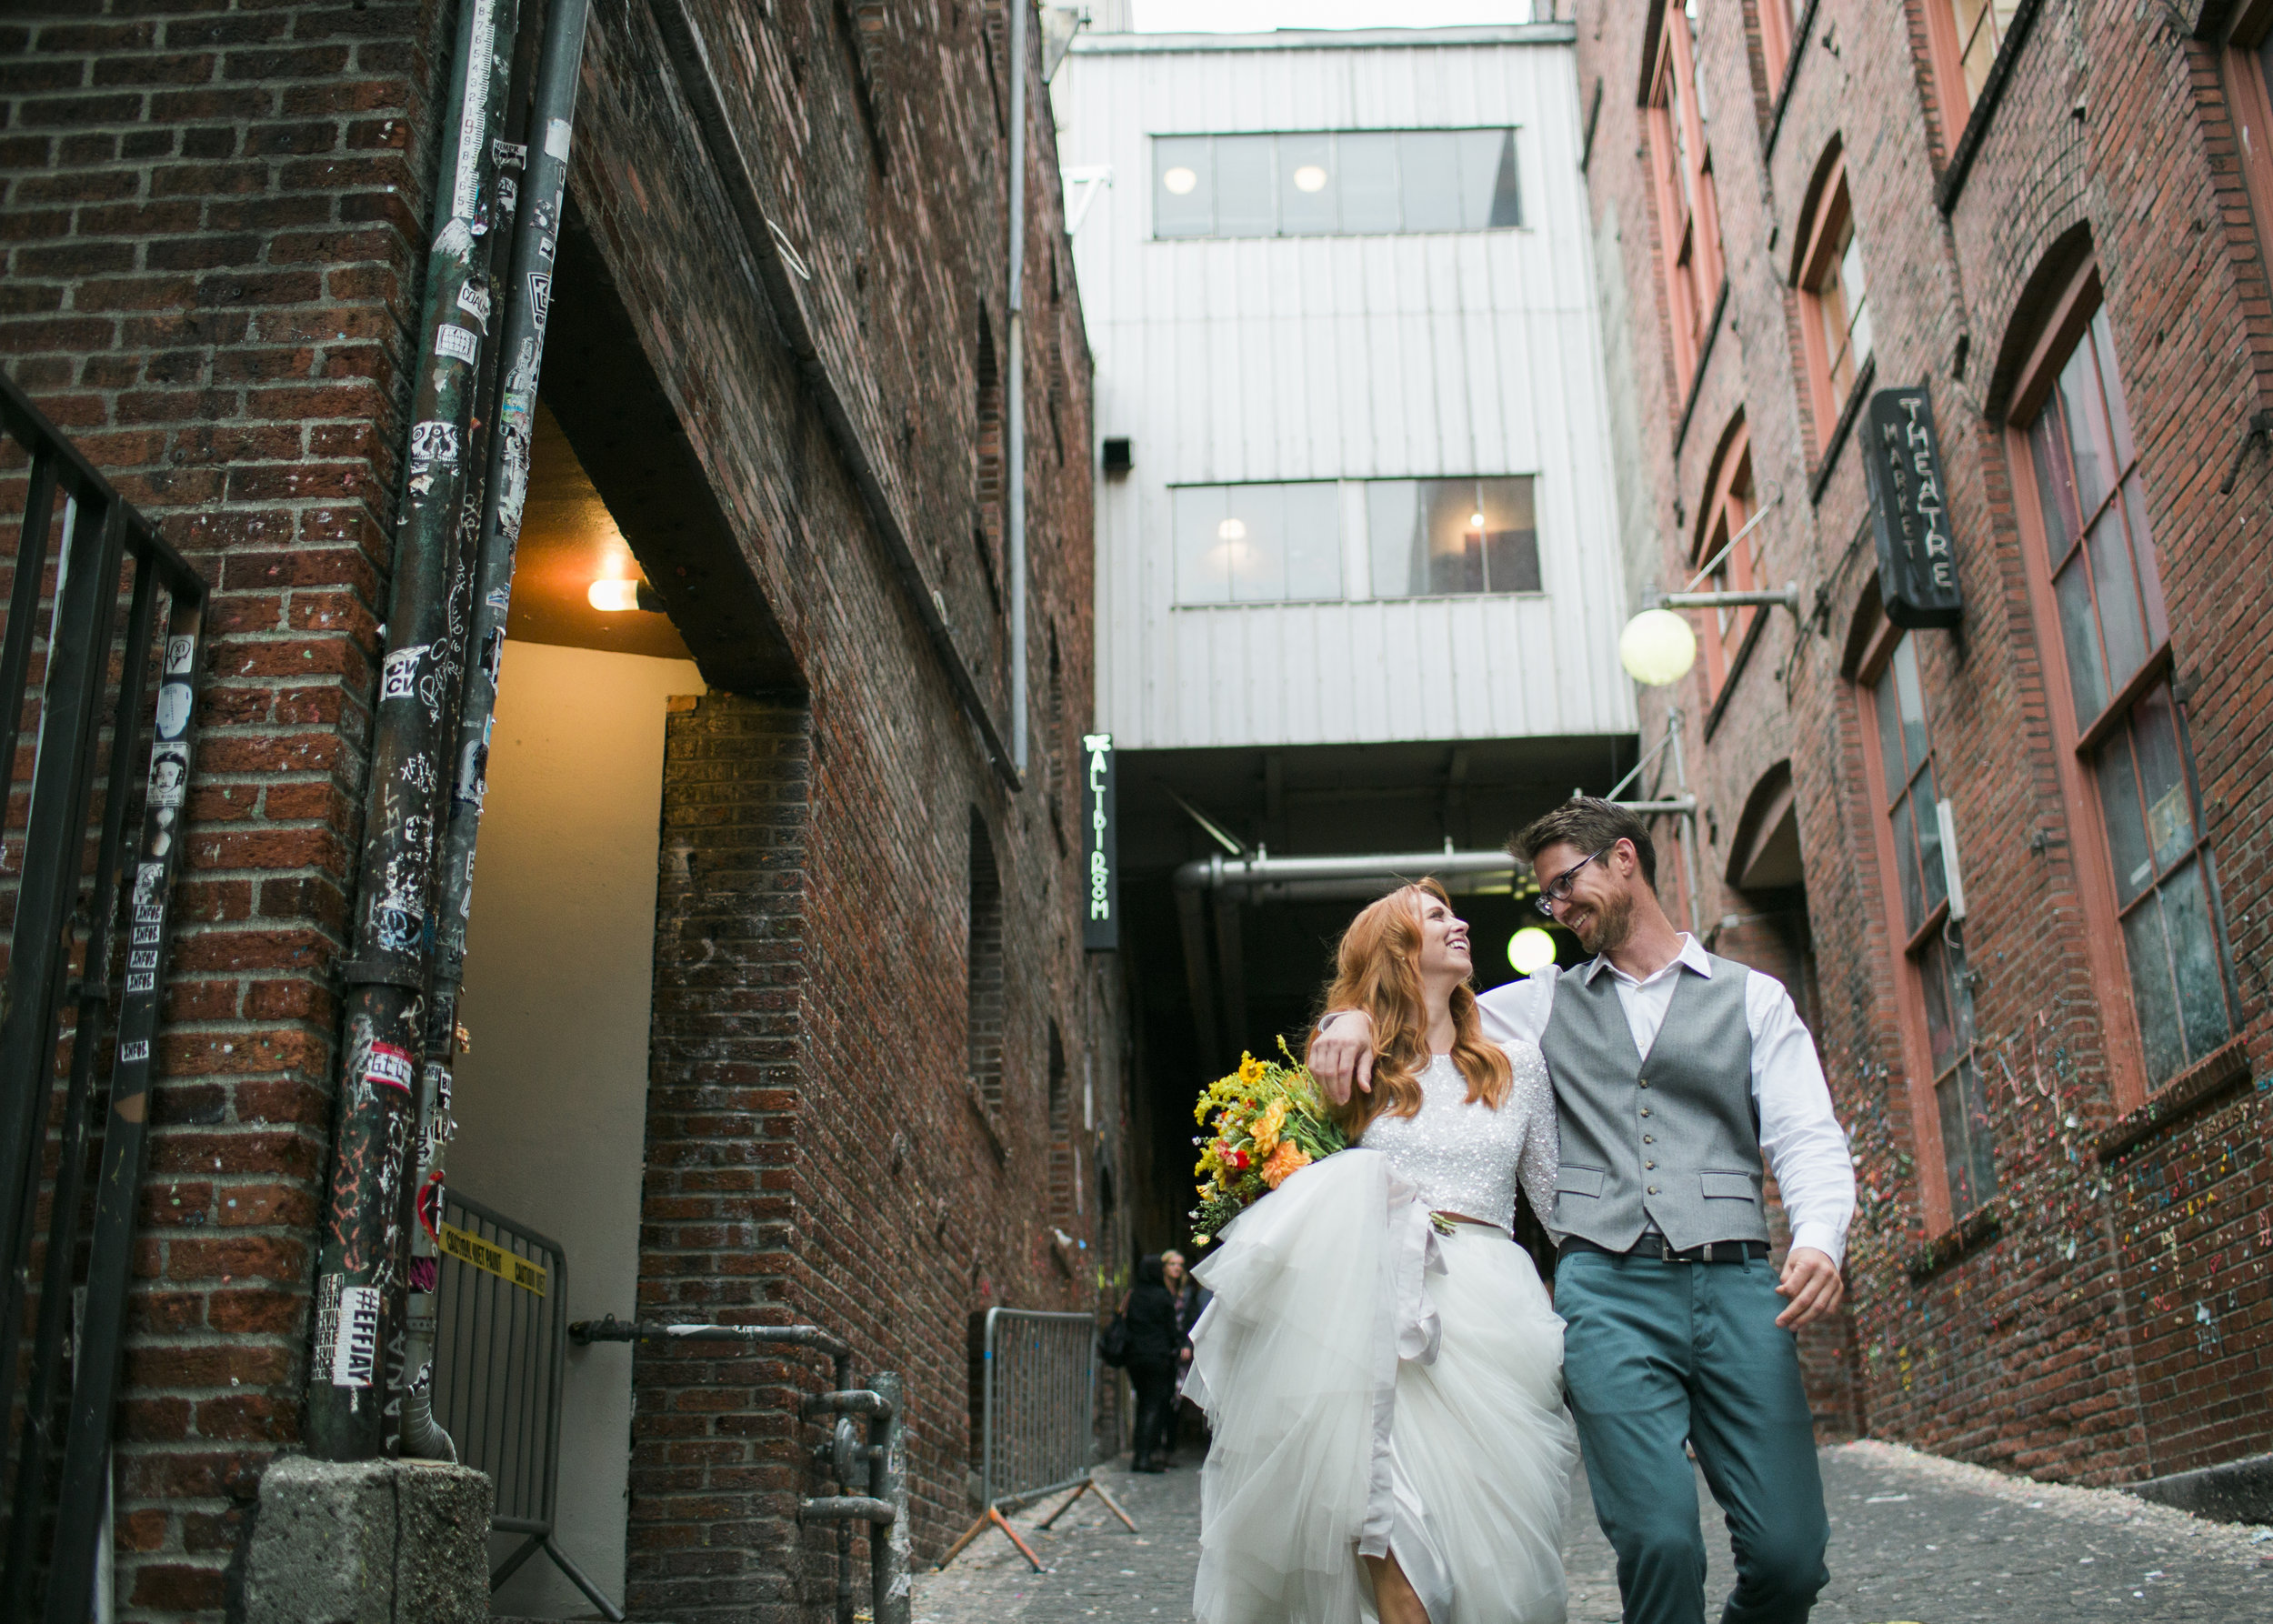 San Francisco Bay Area Wedding Family Photographer 0010.JPG